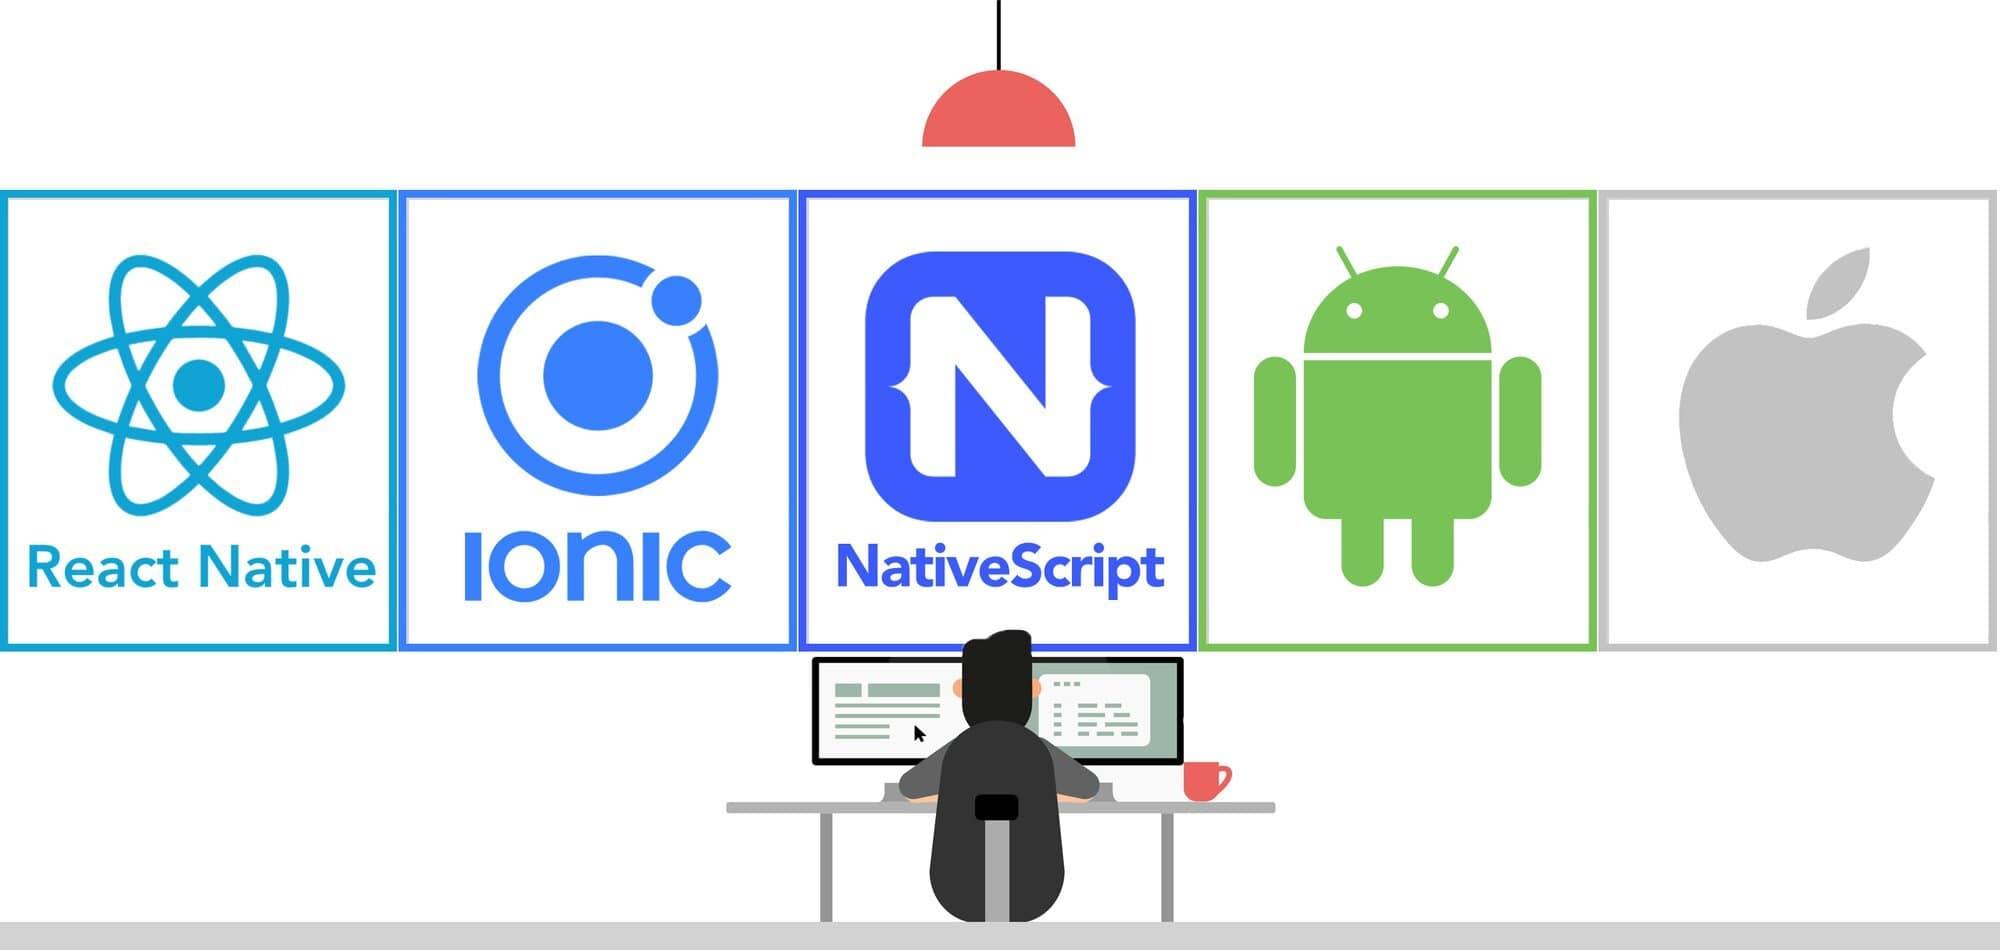 React Native vs Ionic vs NativeScript vs Android/iOS Native for App Development   Raidan.com.au